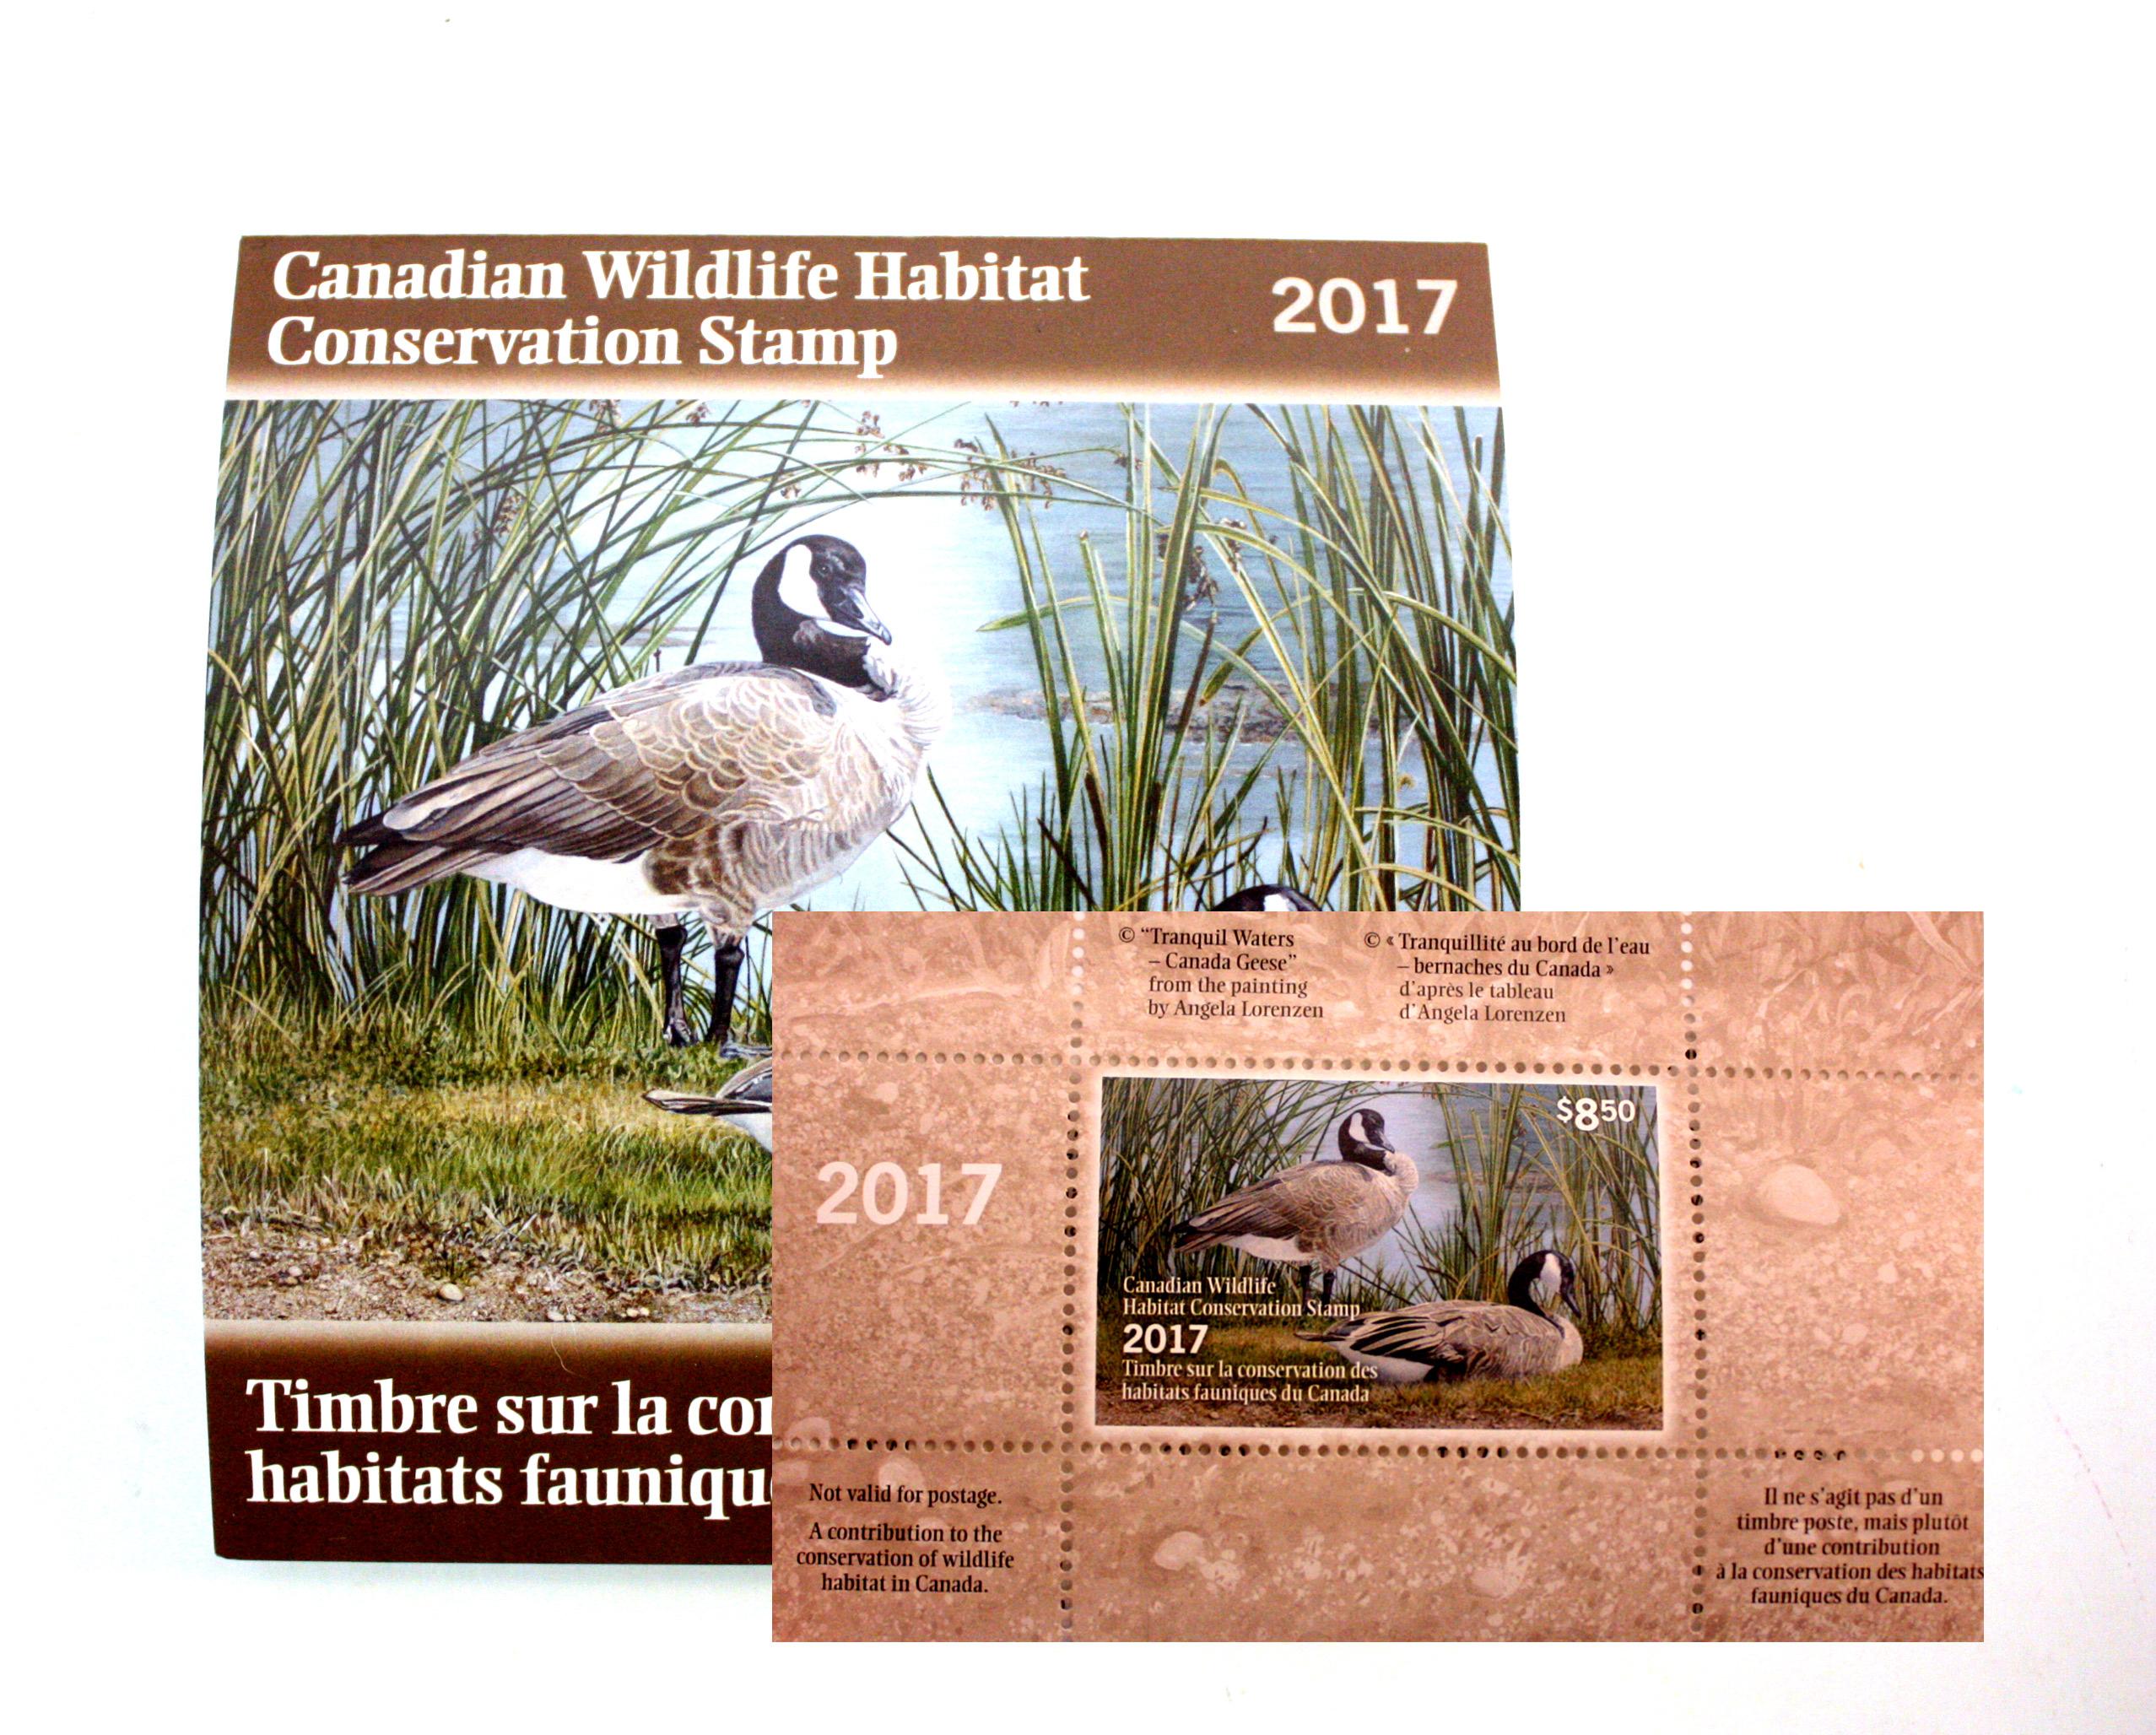 TIMBRES FAUNIQUES -  TIMBRE SUR LA CONSERVATION DES HABITATS FAUNIQUES DU CANADA 2017 33